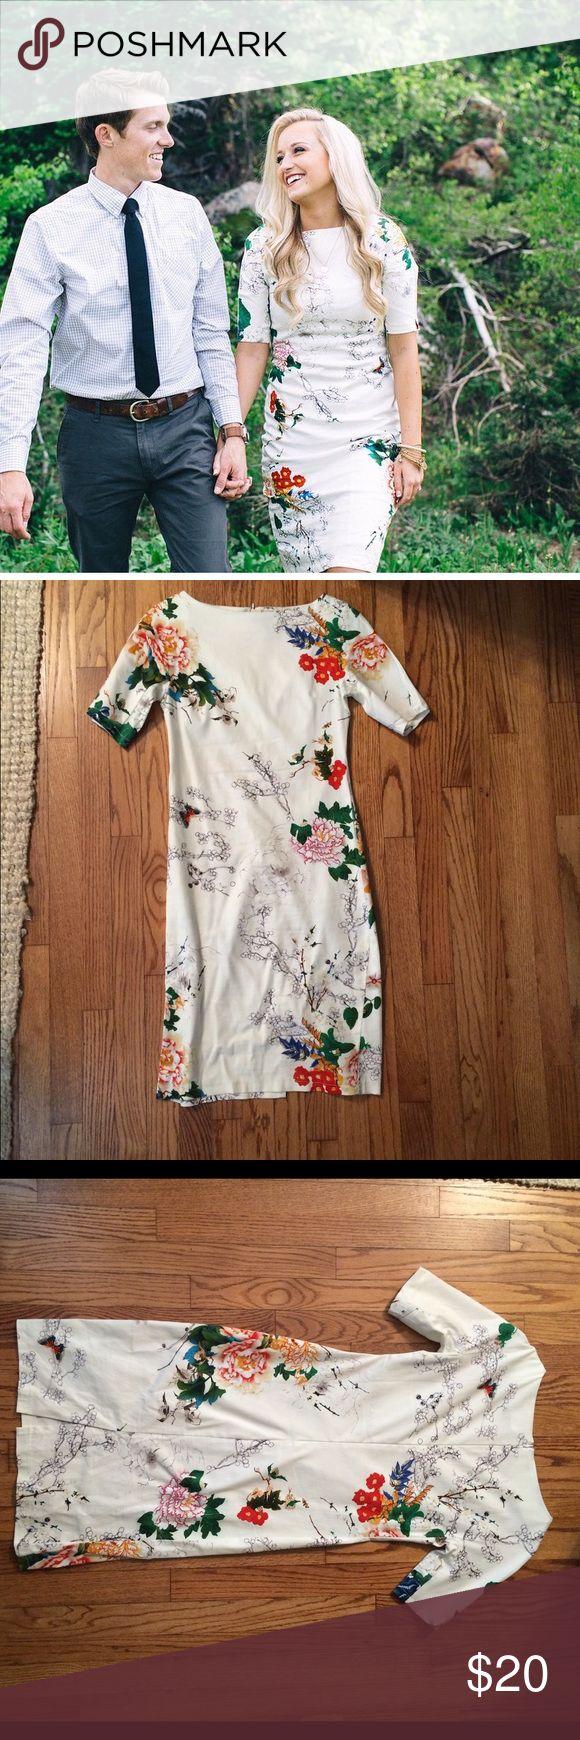 """Toni Dress"" from Roolee Boutique sz SM Short sleeve floral and butterfly, sheath dress. Boatneck. Shoulders 38cm, Bust 82-86cm, Waist 70cm, Hip 86 cm, Length 96 cm Roolee Boutique Dresses"